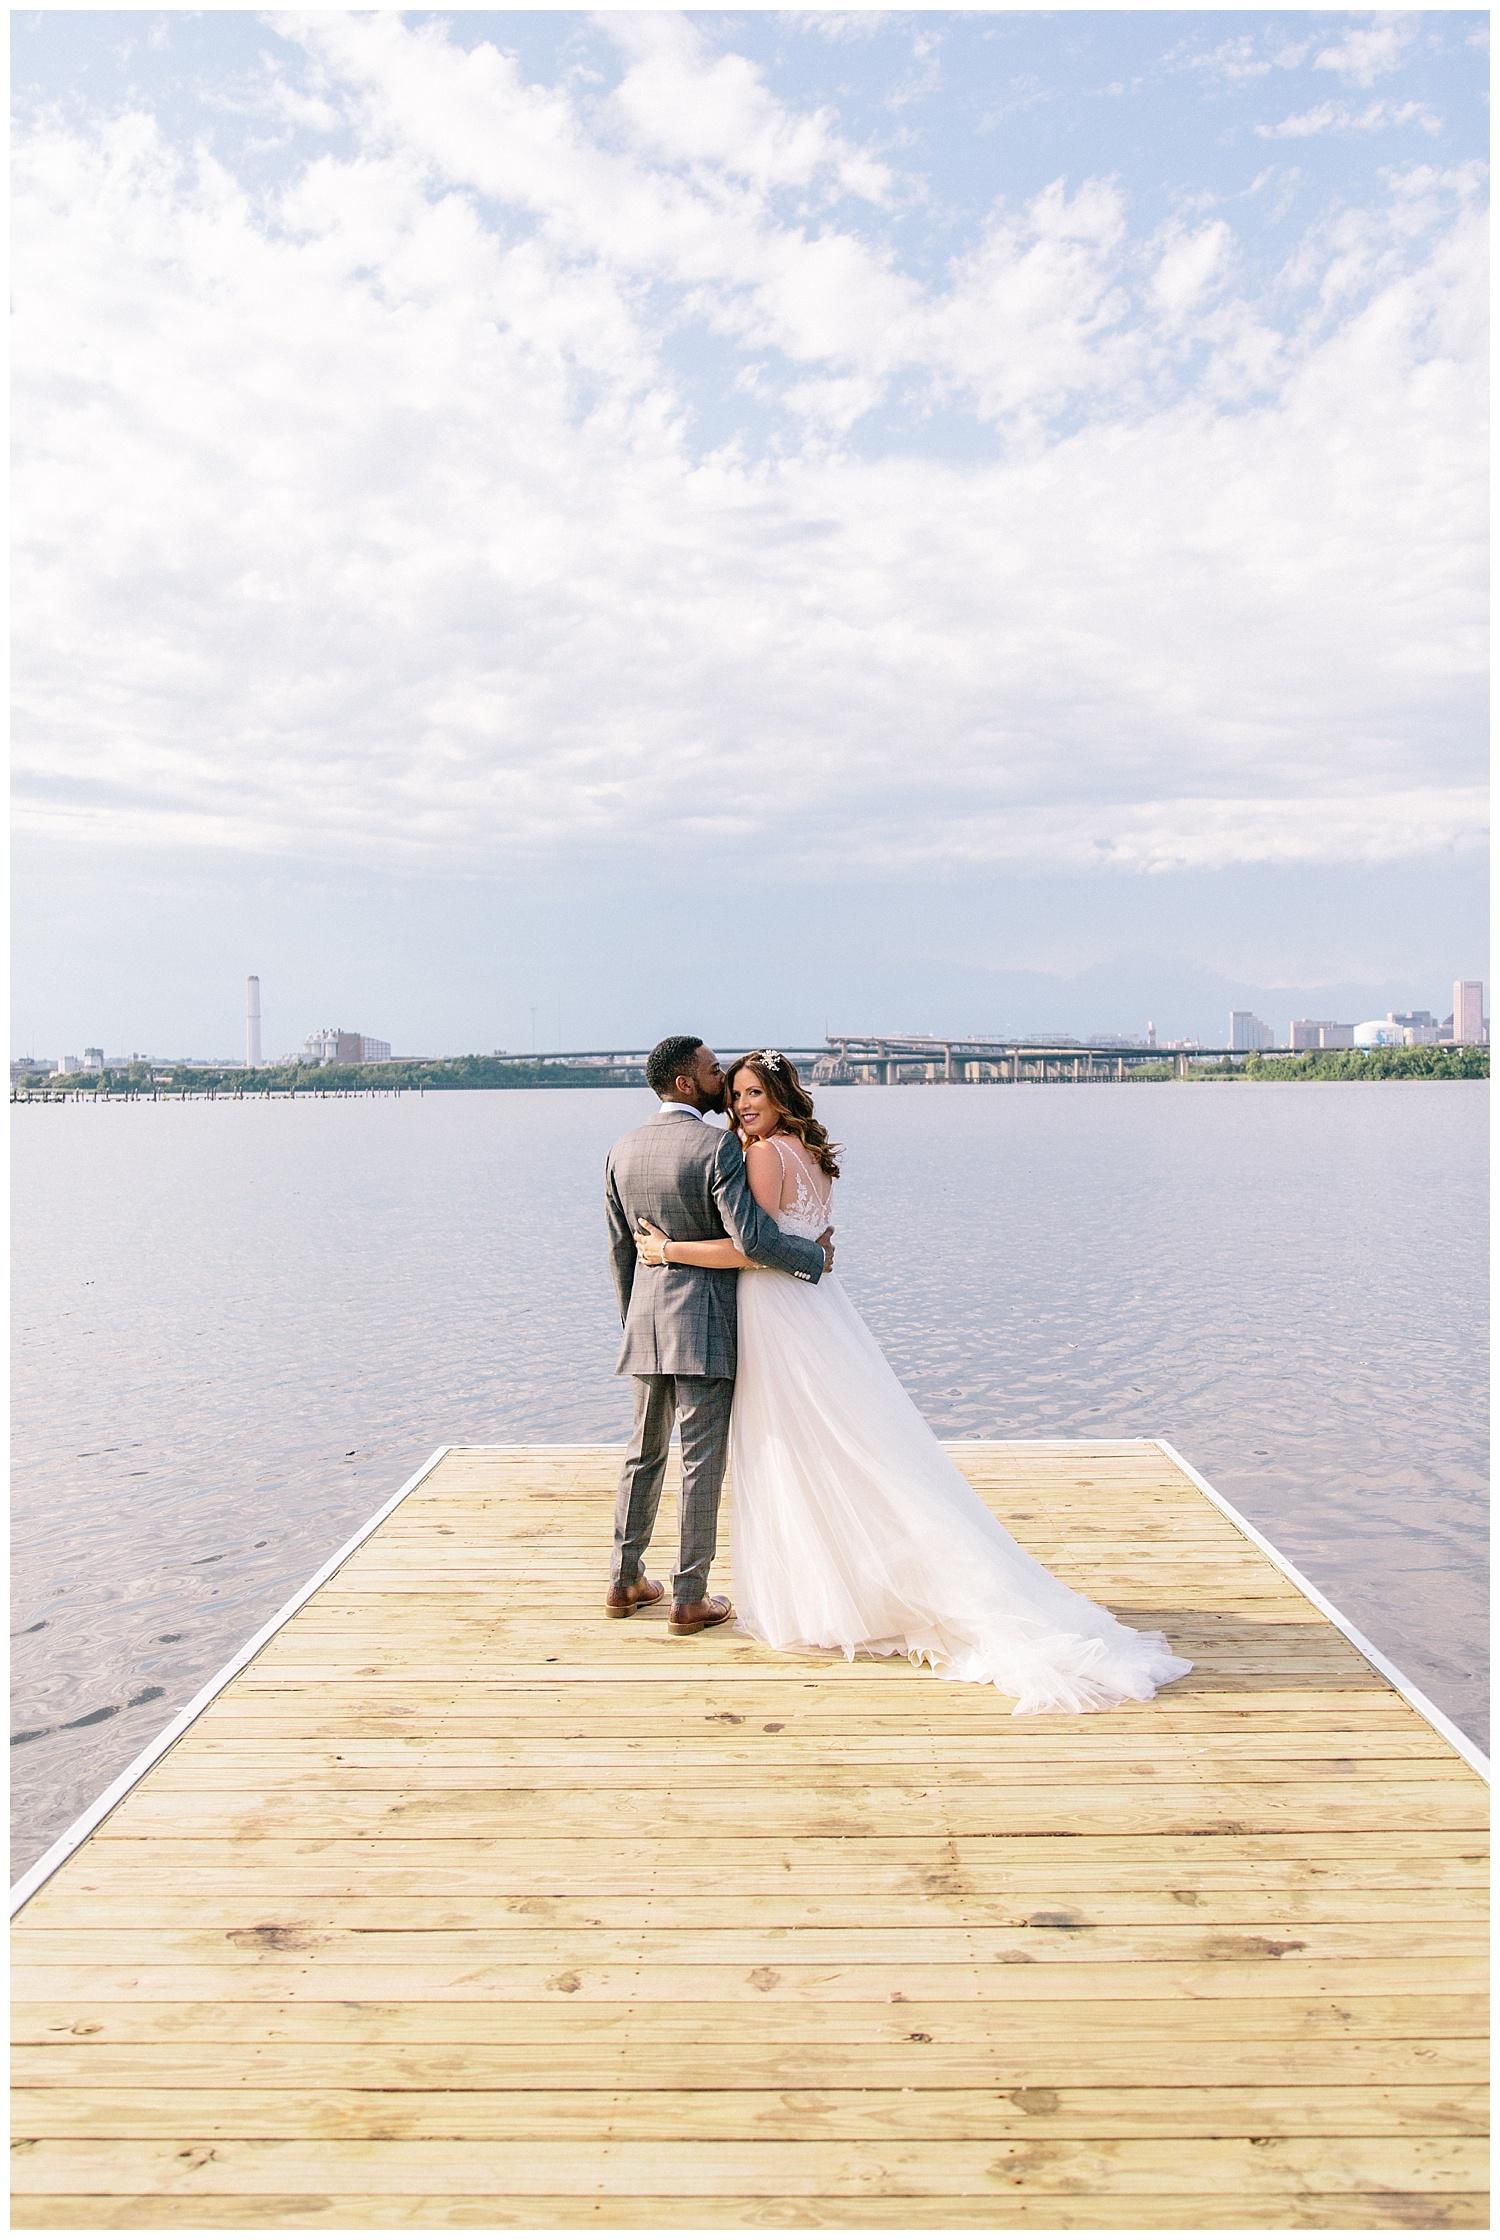 emily-belson-photography-baltimore-rowing-club-wedding-025.jpg